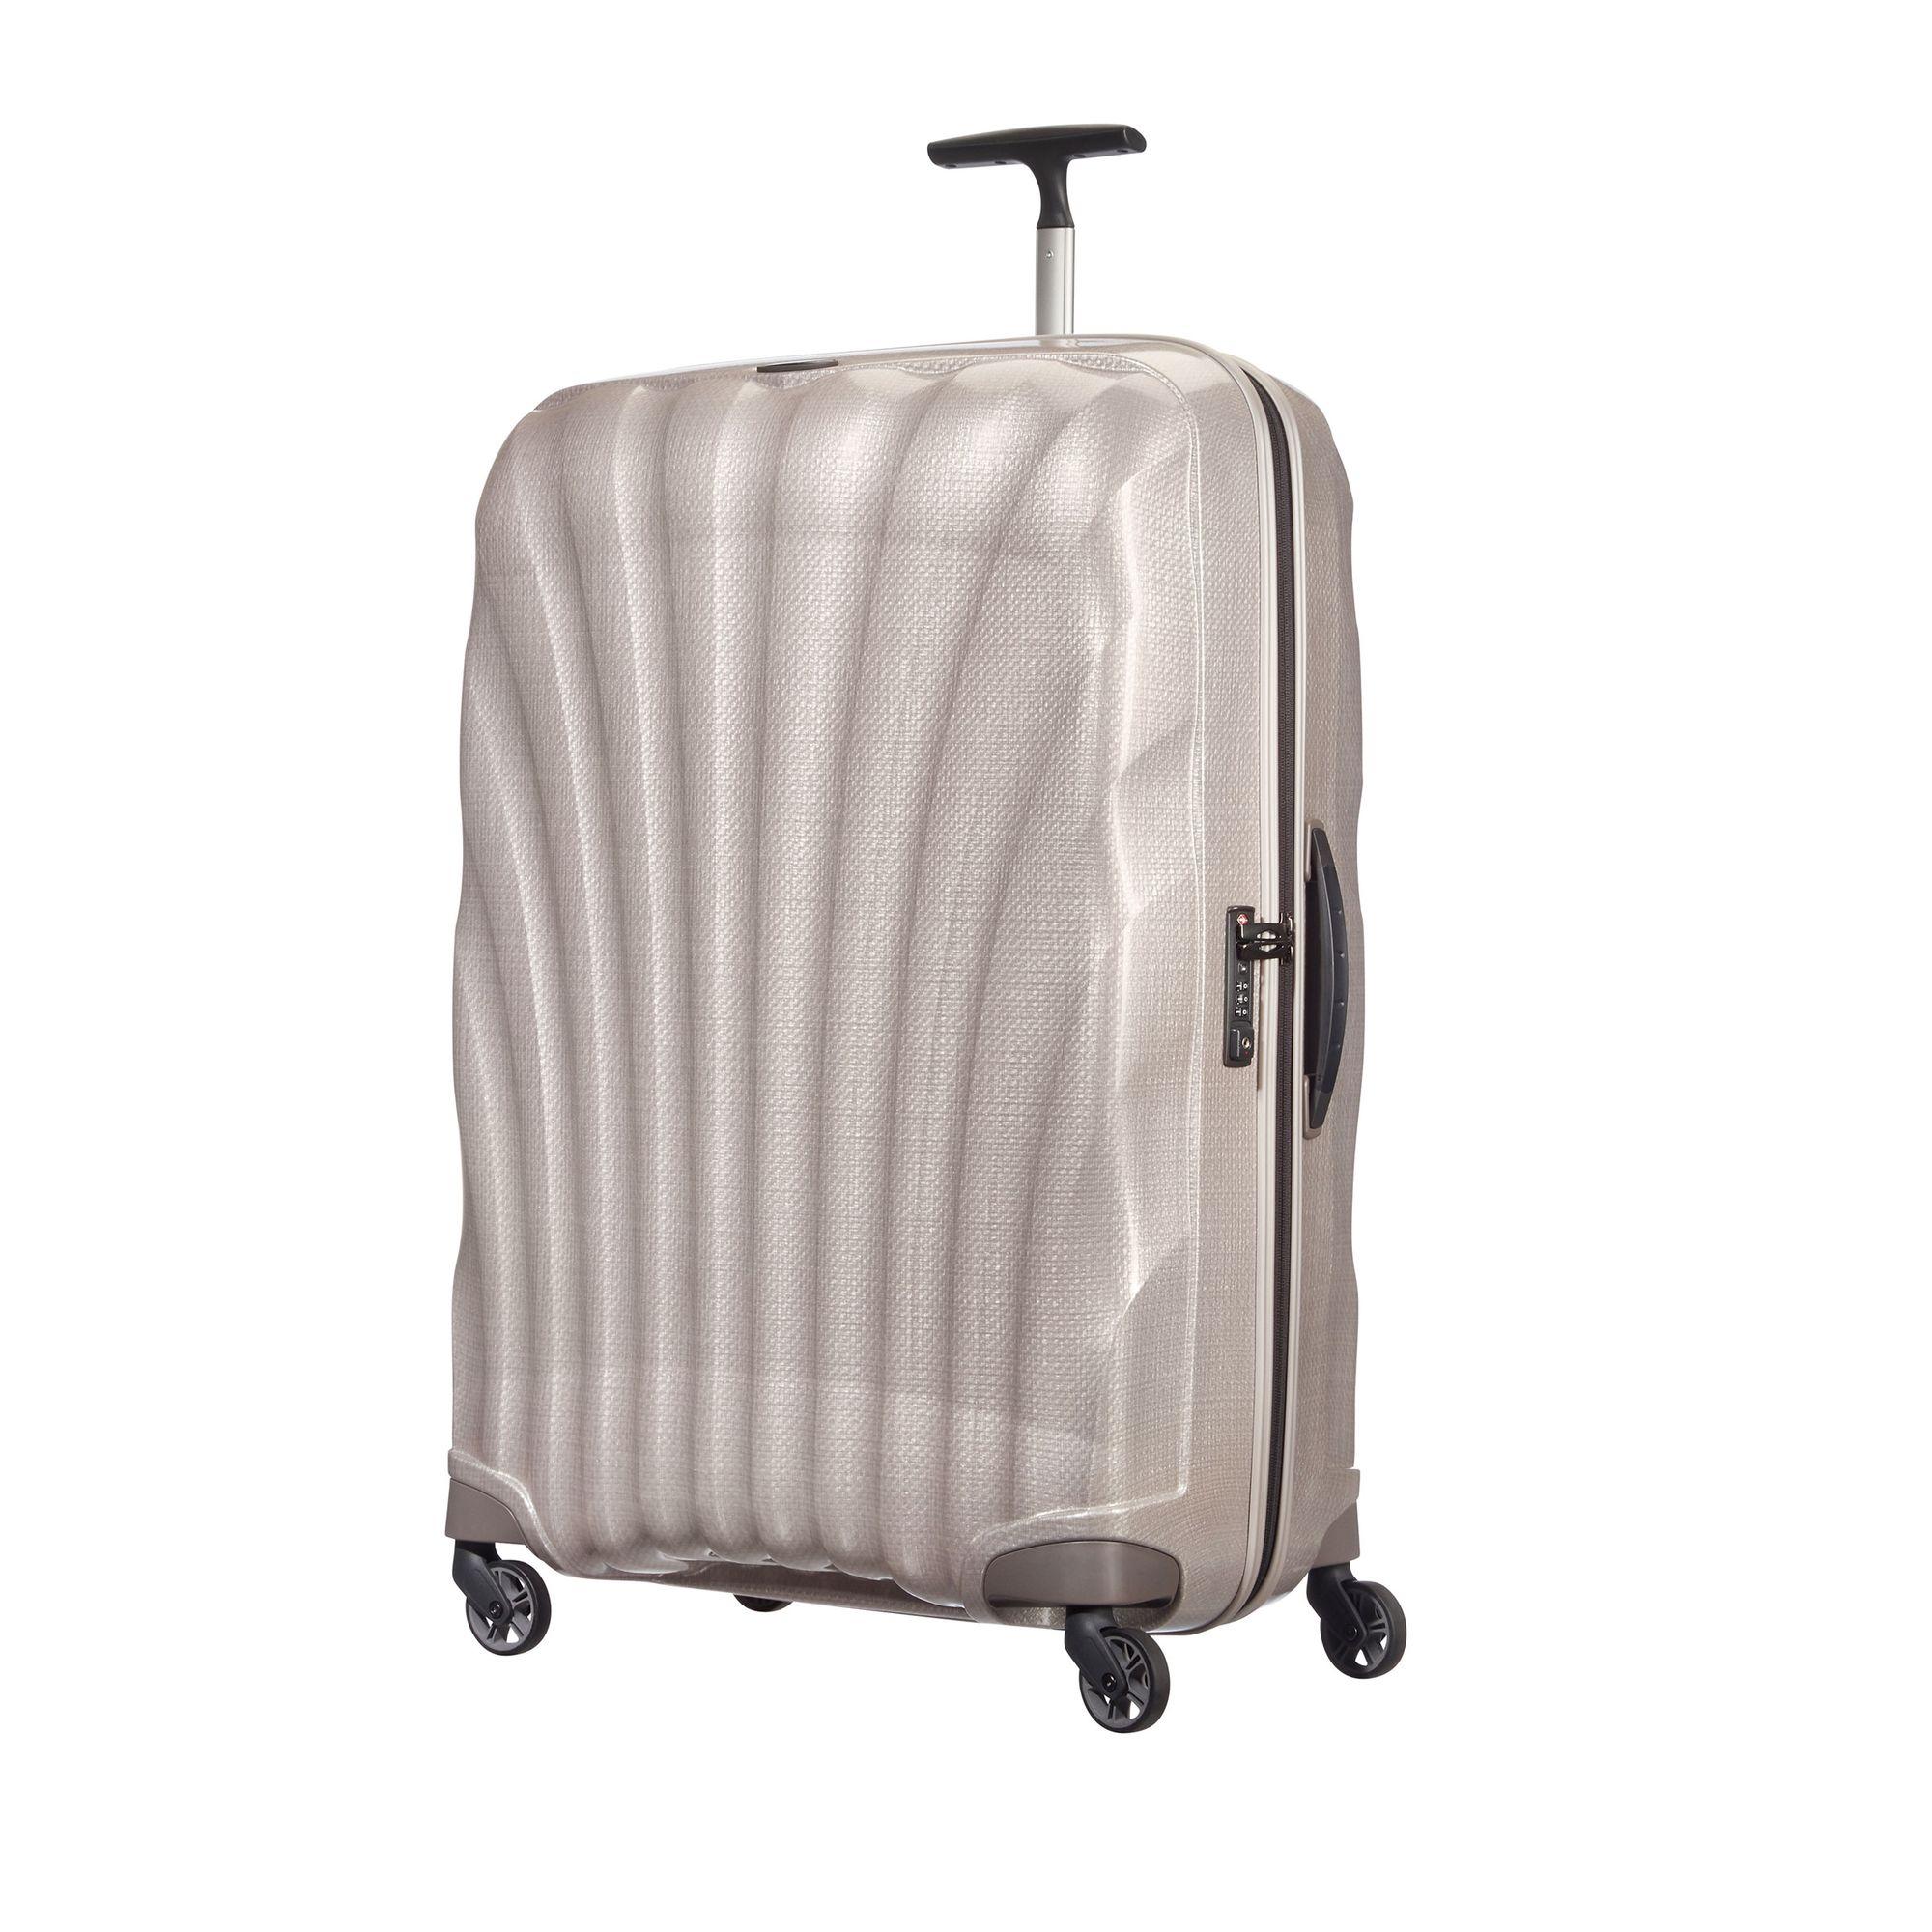 Samsonite Cosmolite hård resväska, 4 hjul, 81 cm, Pärlvit